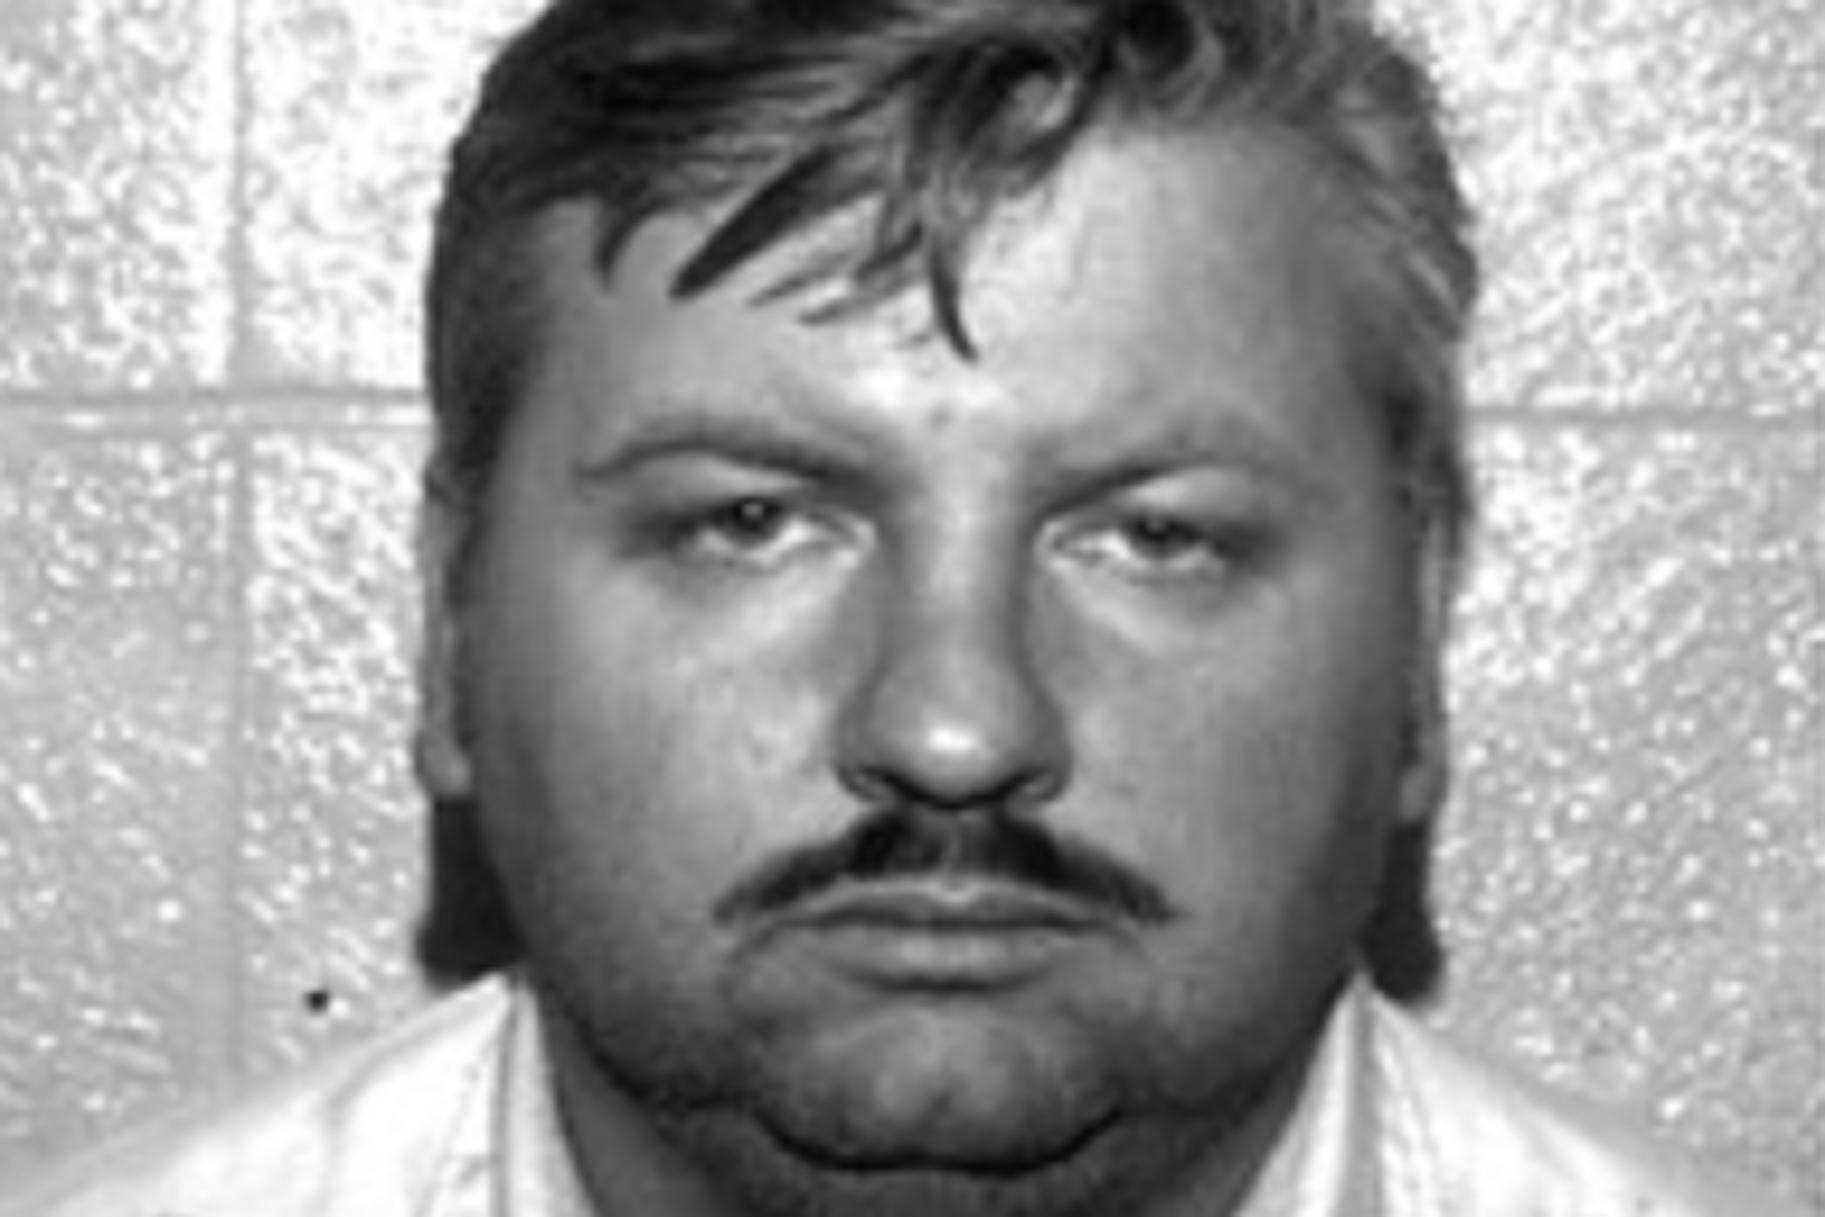 De The Zodiac Killer a John Wayne Gacy: 5 asesinos espeluznantes vestían disfraces